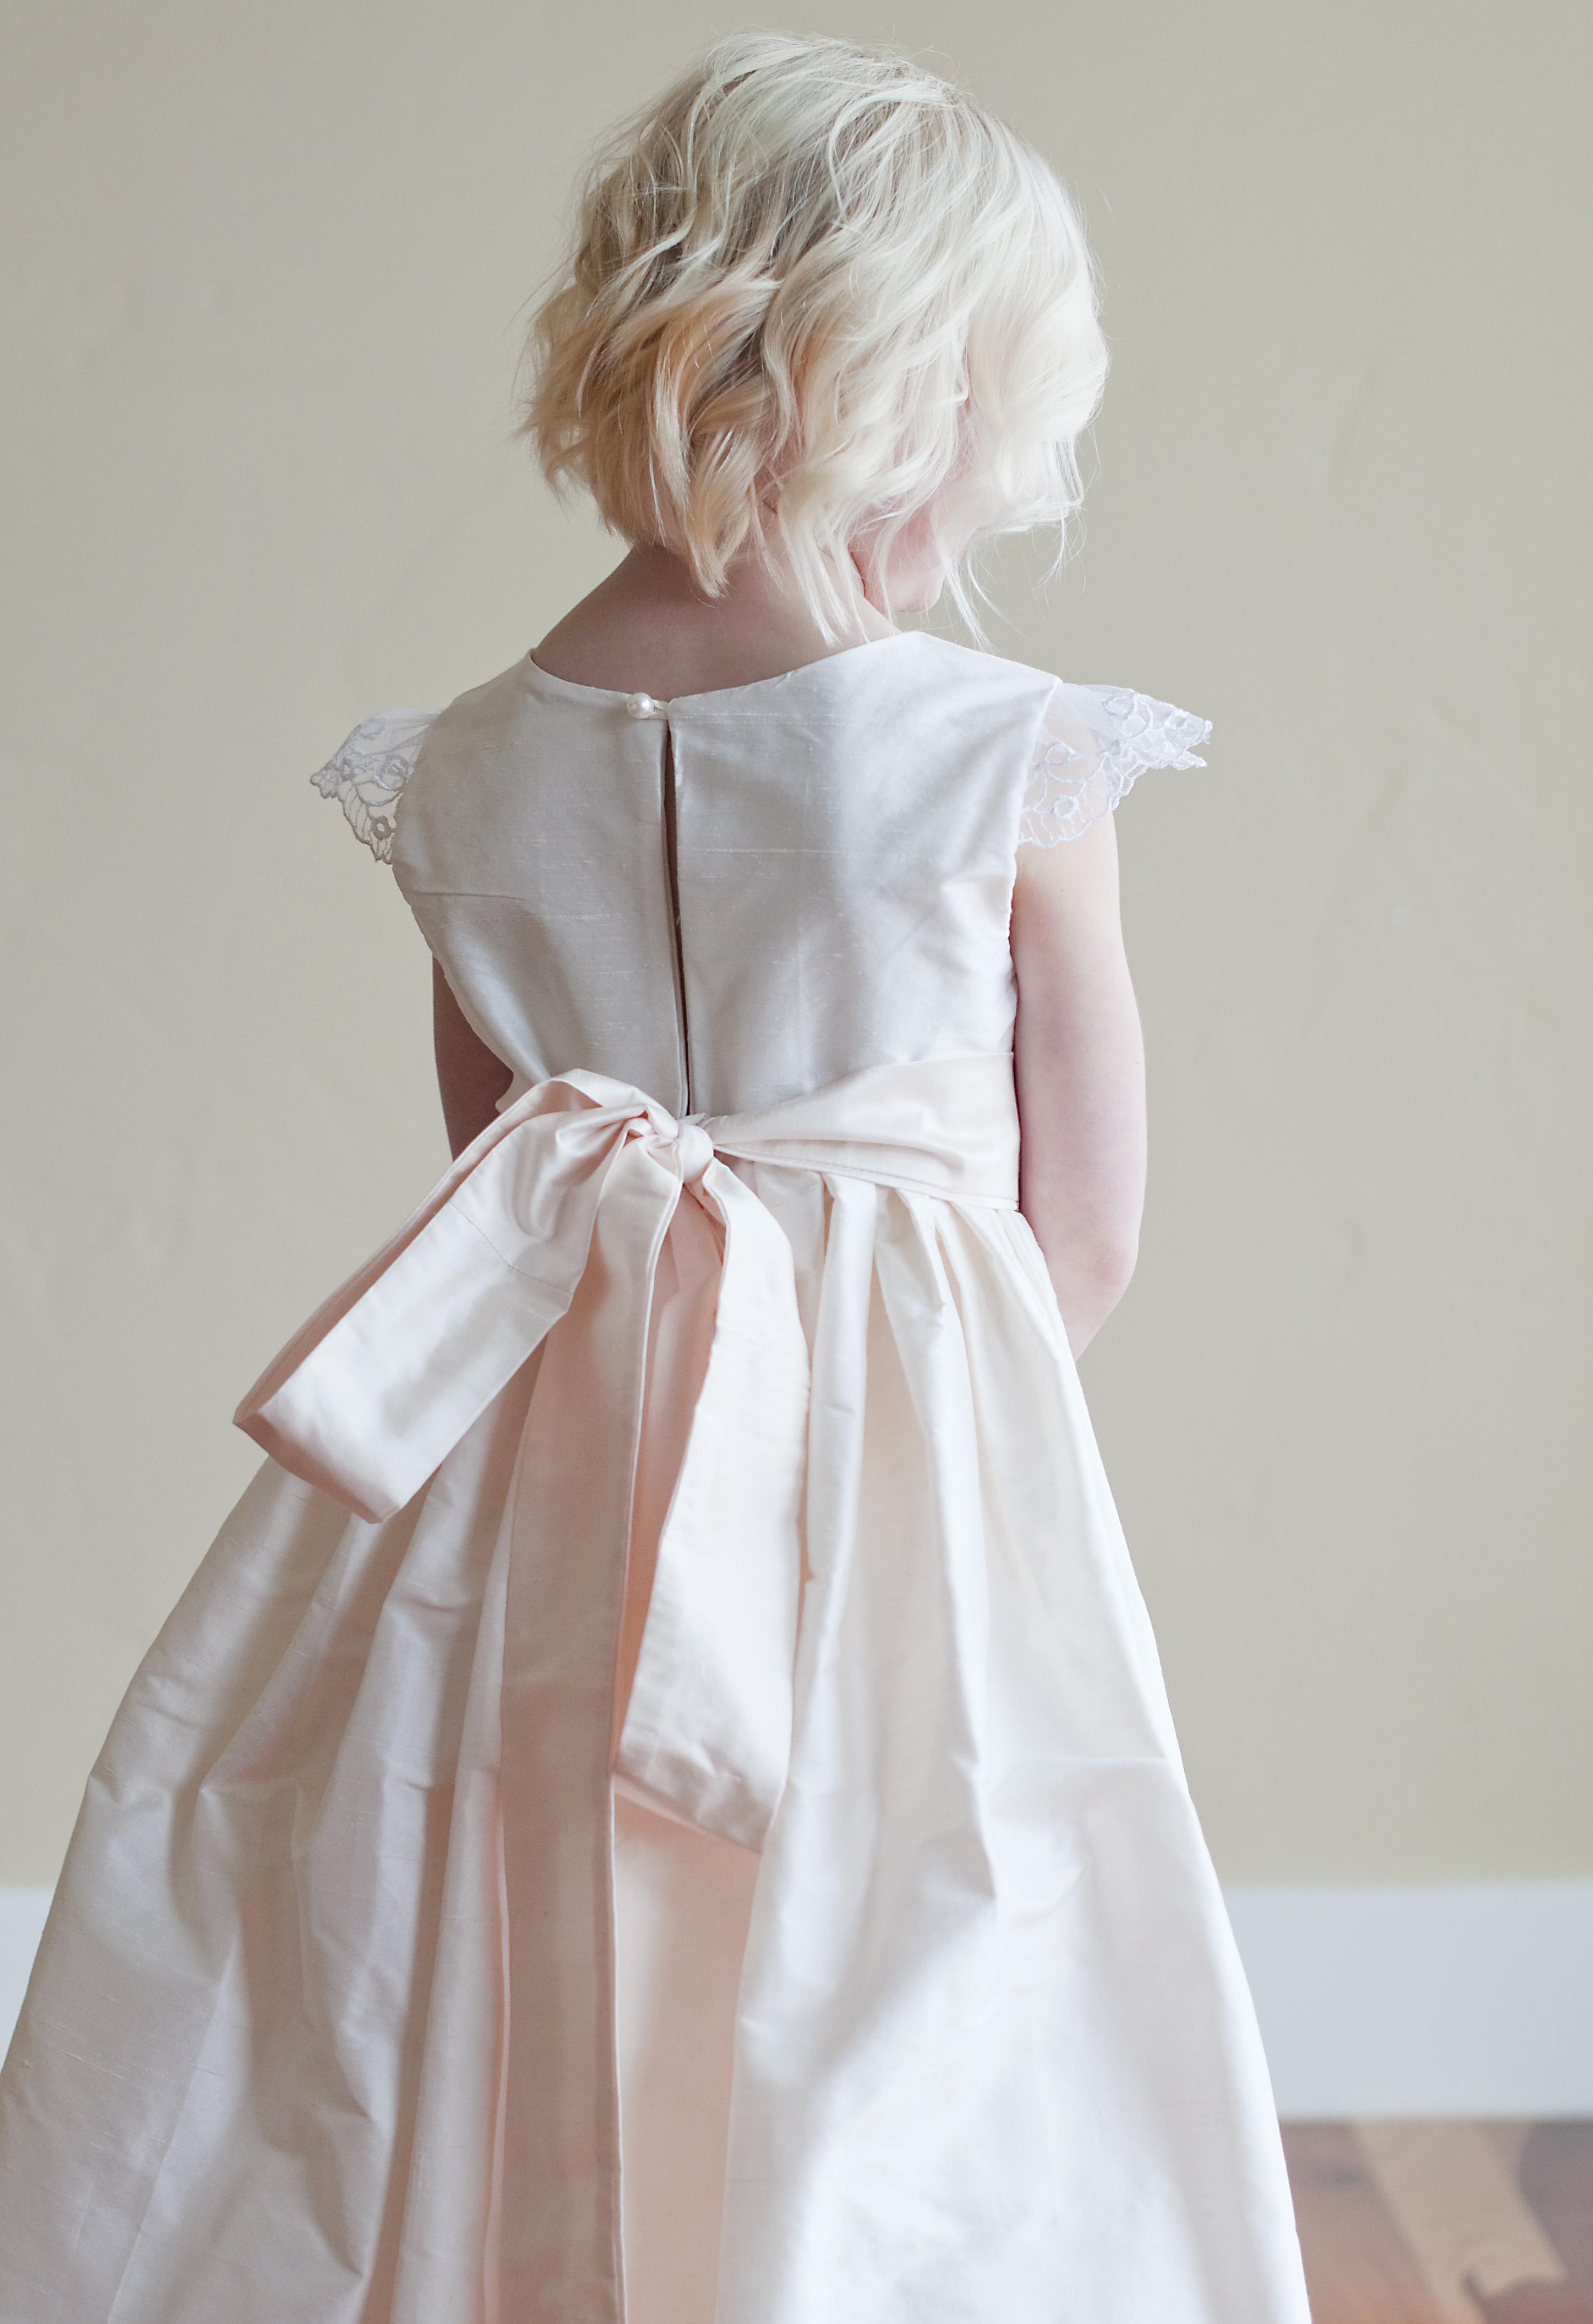 Browse Our Wonderful Range Of Pure Silk Handmade Flower Girl